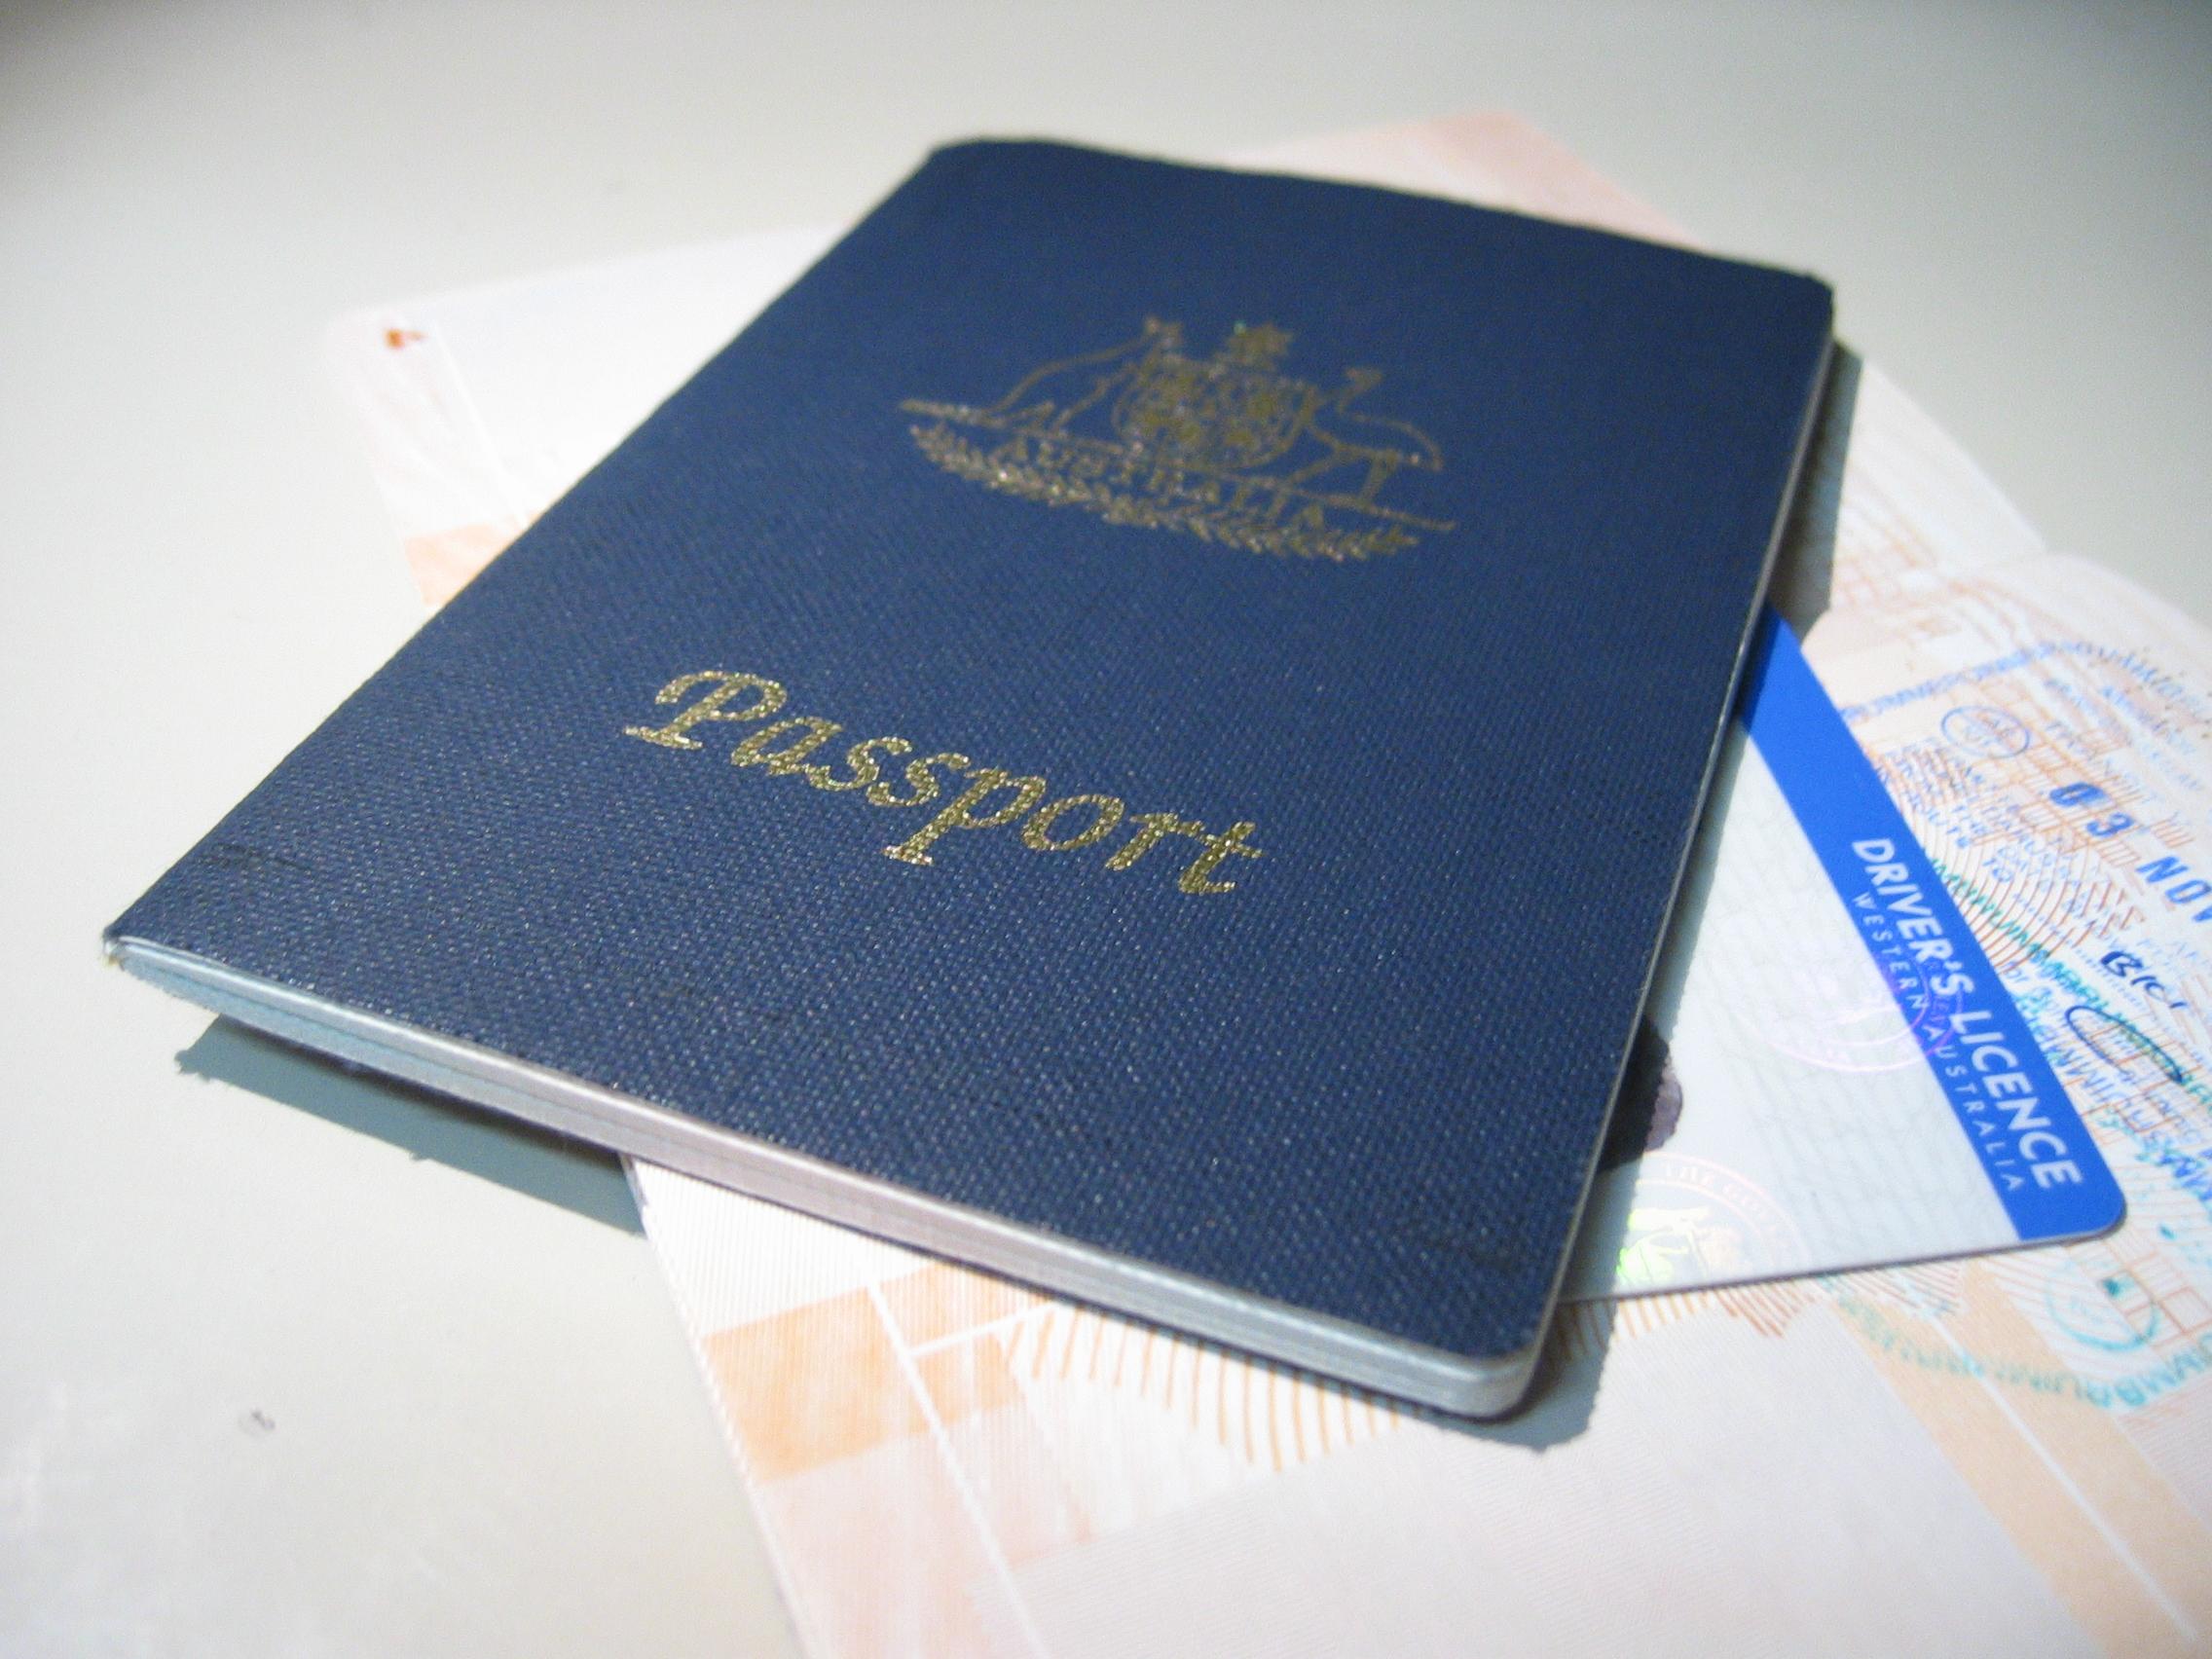 passports - drivers license - identity documents